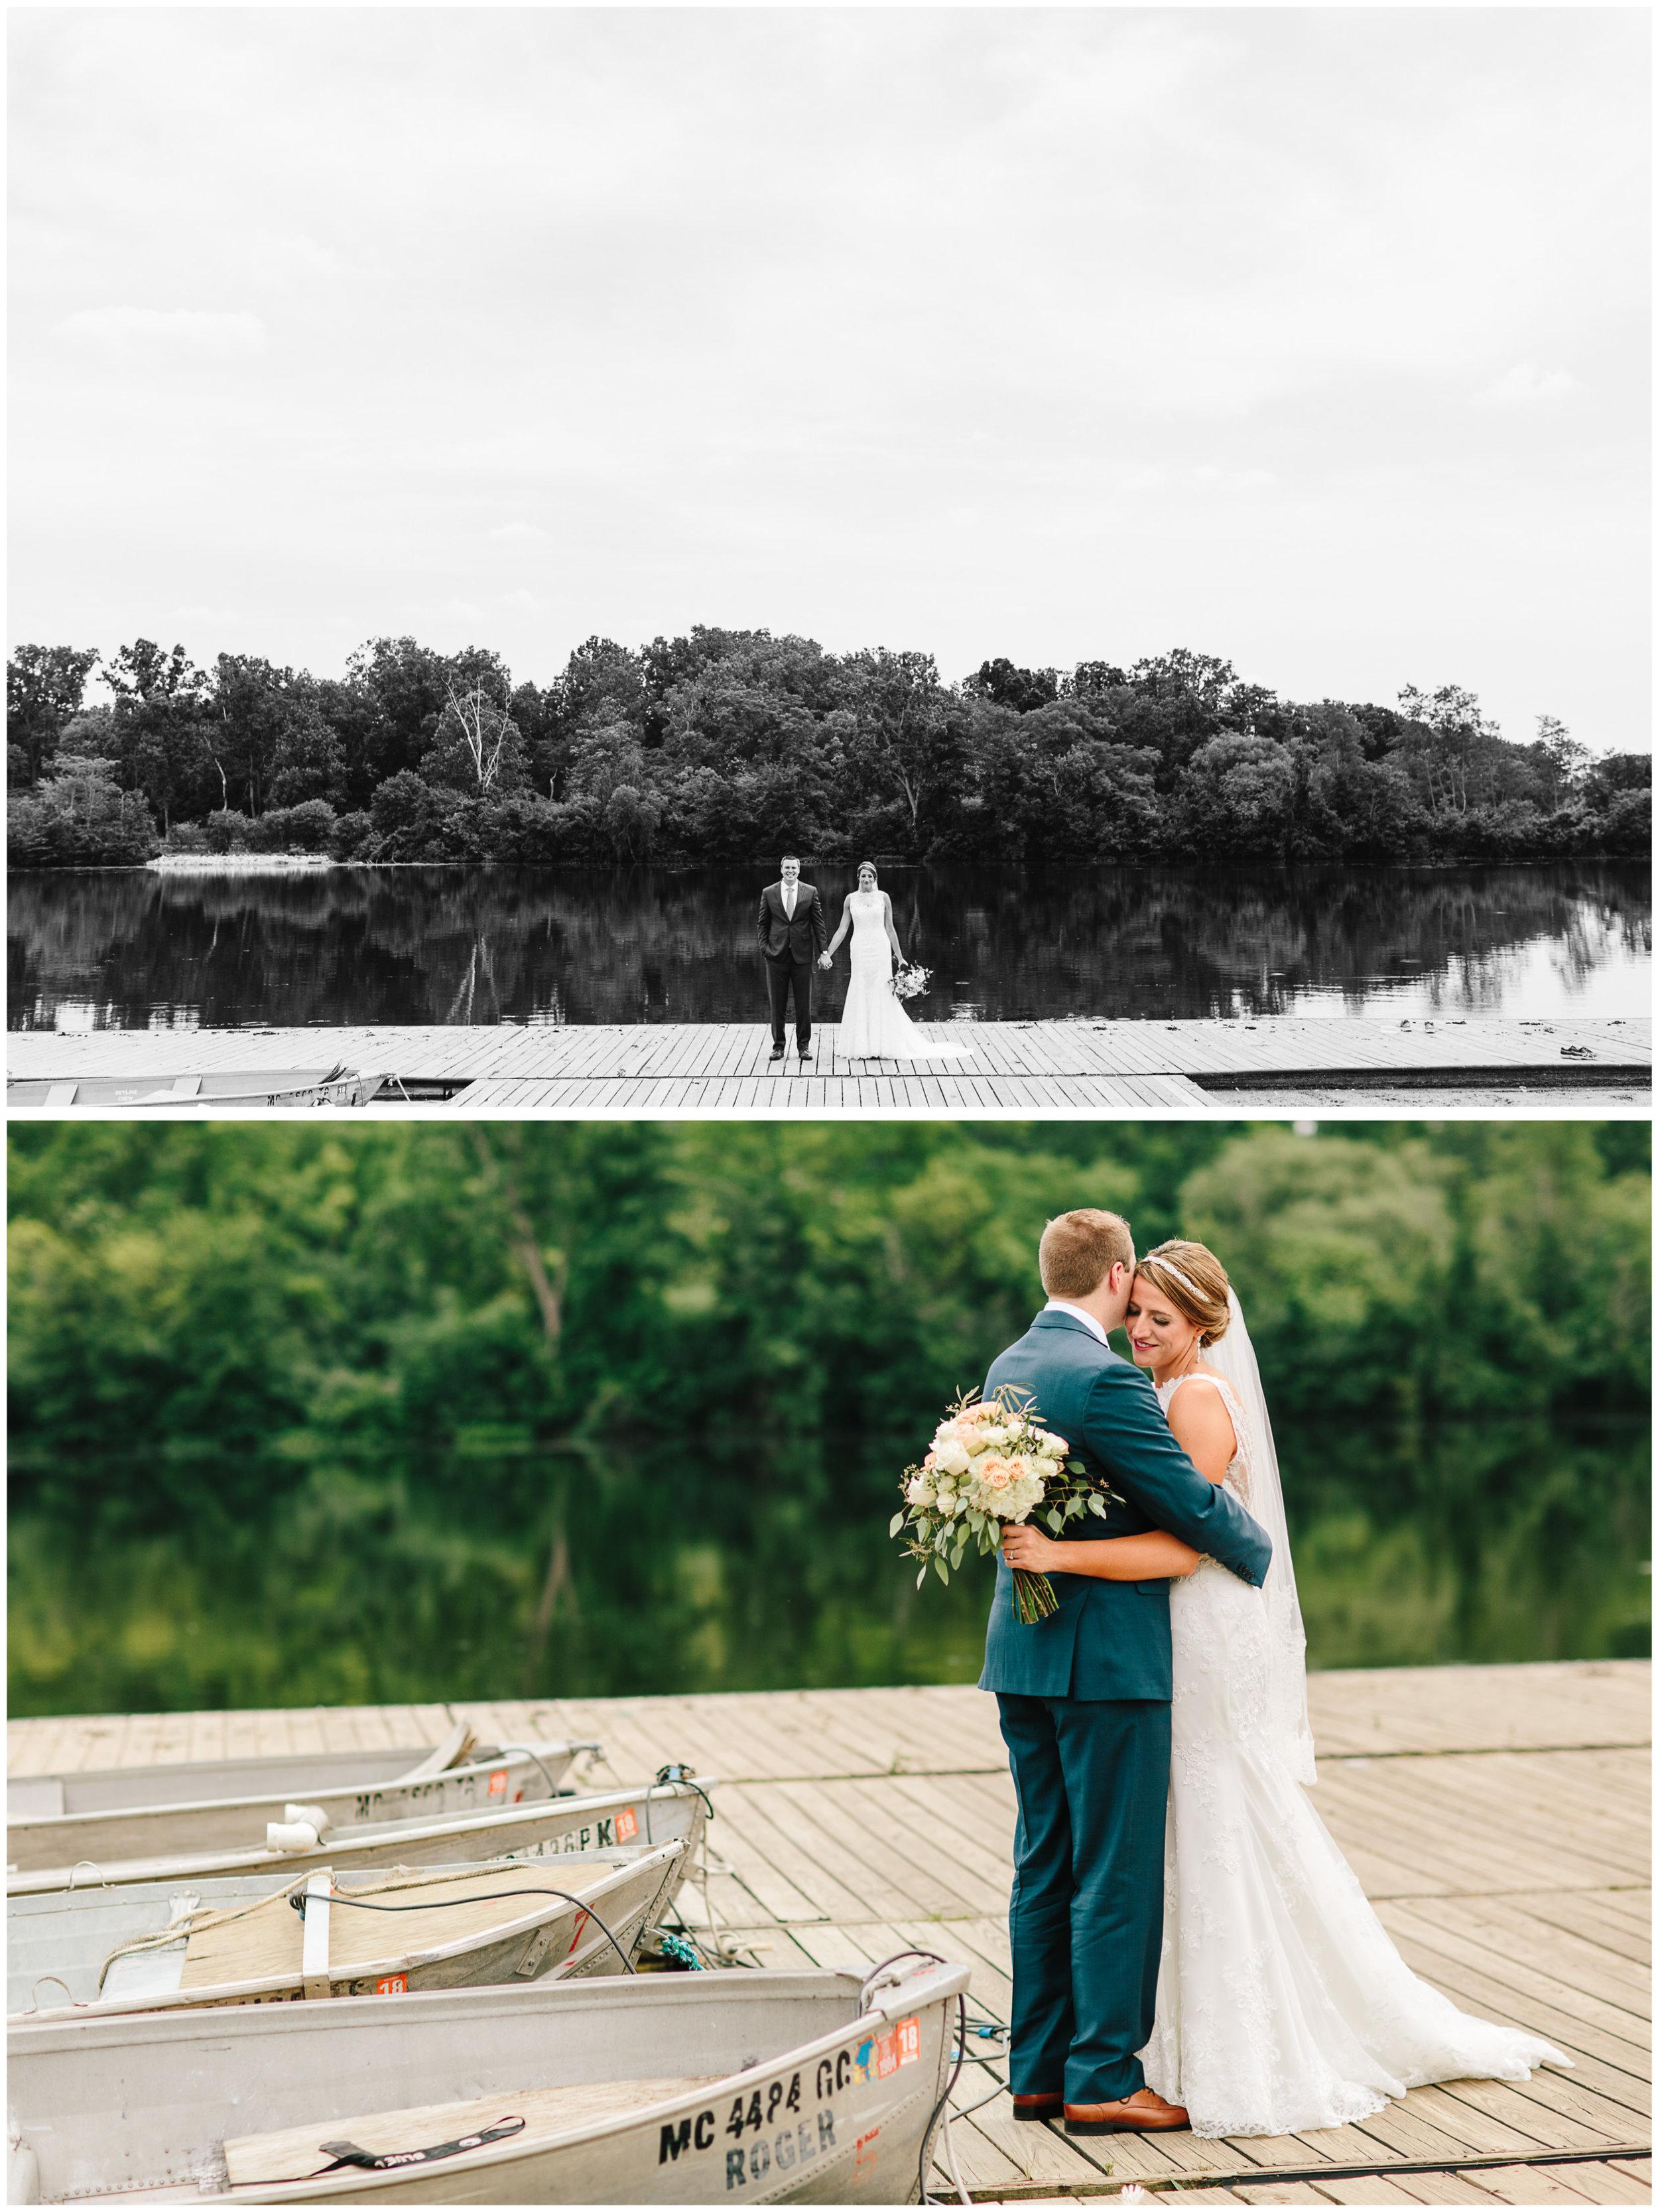 ann_arbor_michigan_wedding_39.jpg